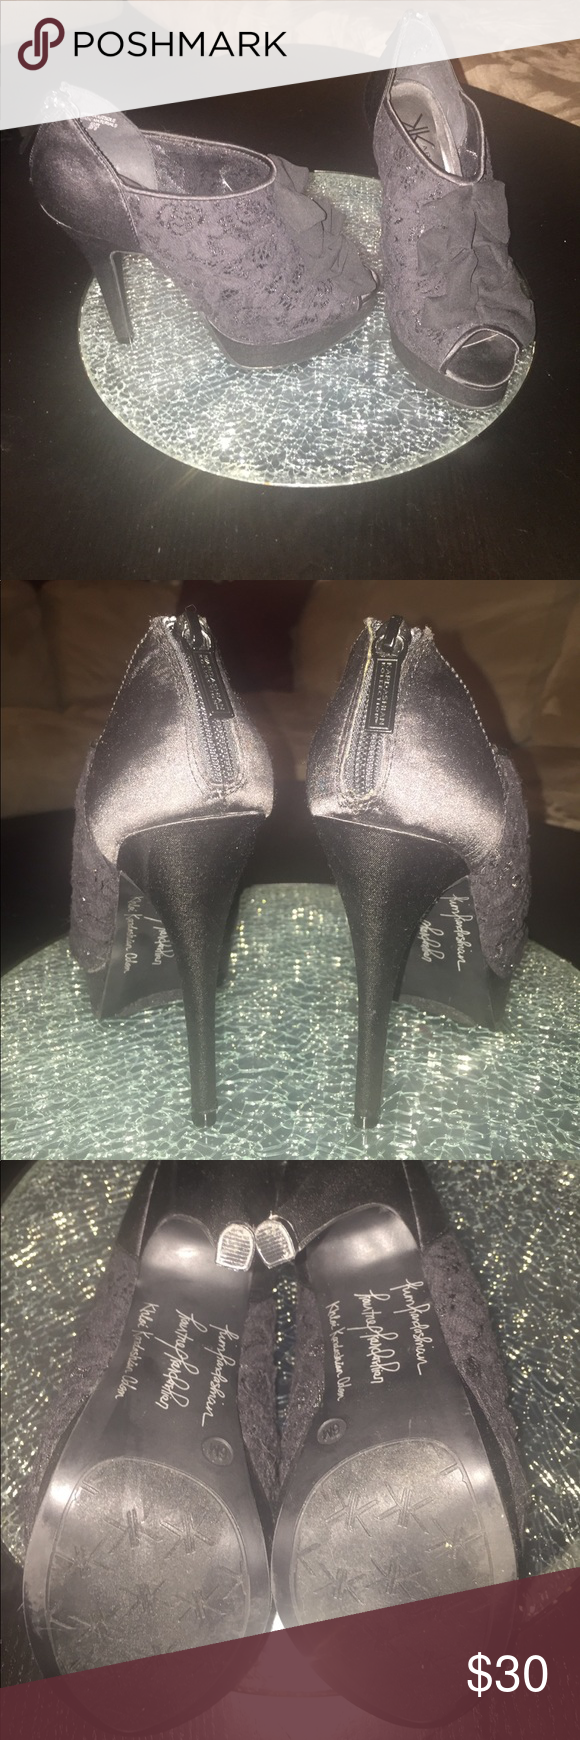 Kardashian Kollection heels Great condition Kardashian Kollection Shoes Heels